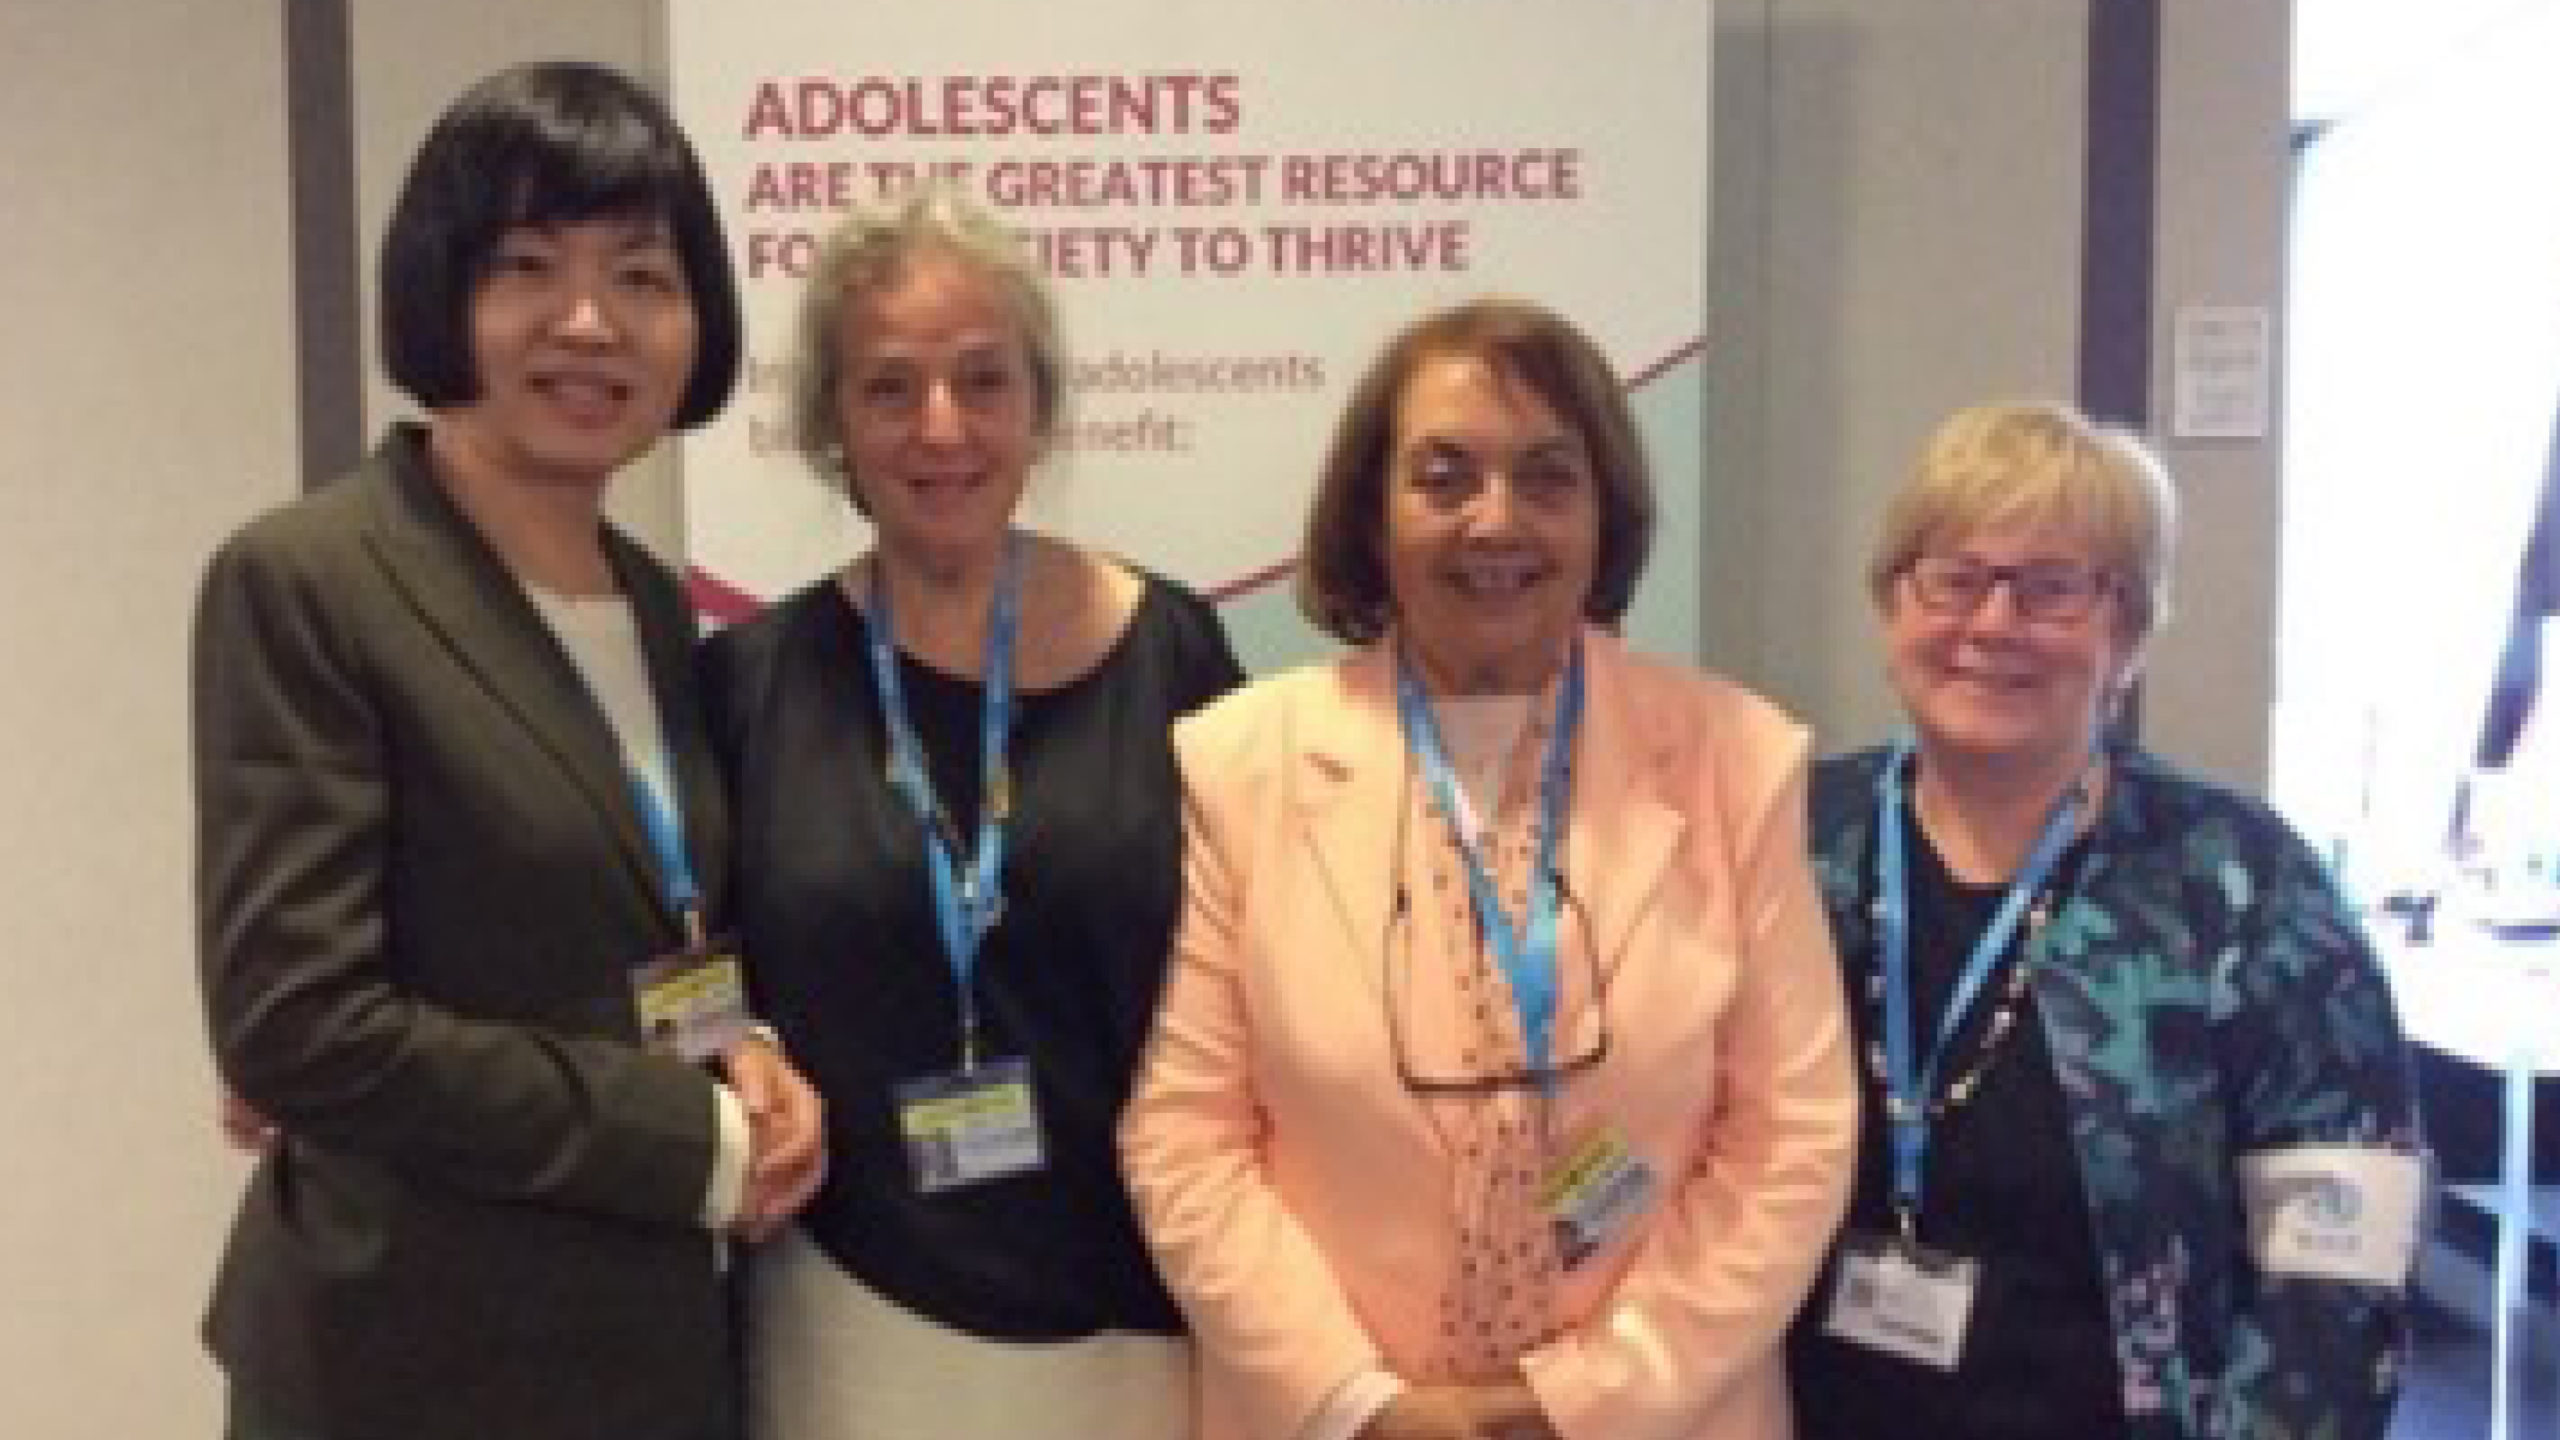 Drs Chuong-Huey Lai (Taiwan), Clarissa Fabre (UK), Shafika Nasser (Egypt) and Shelley Ross (Canada)